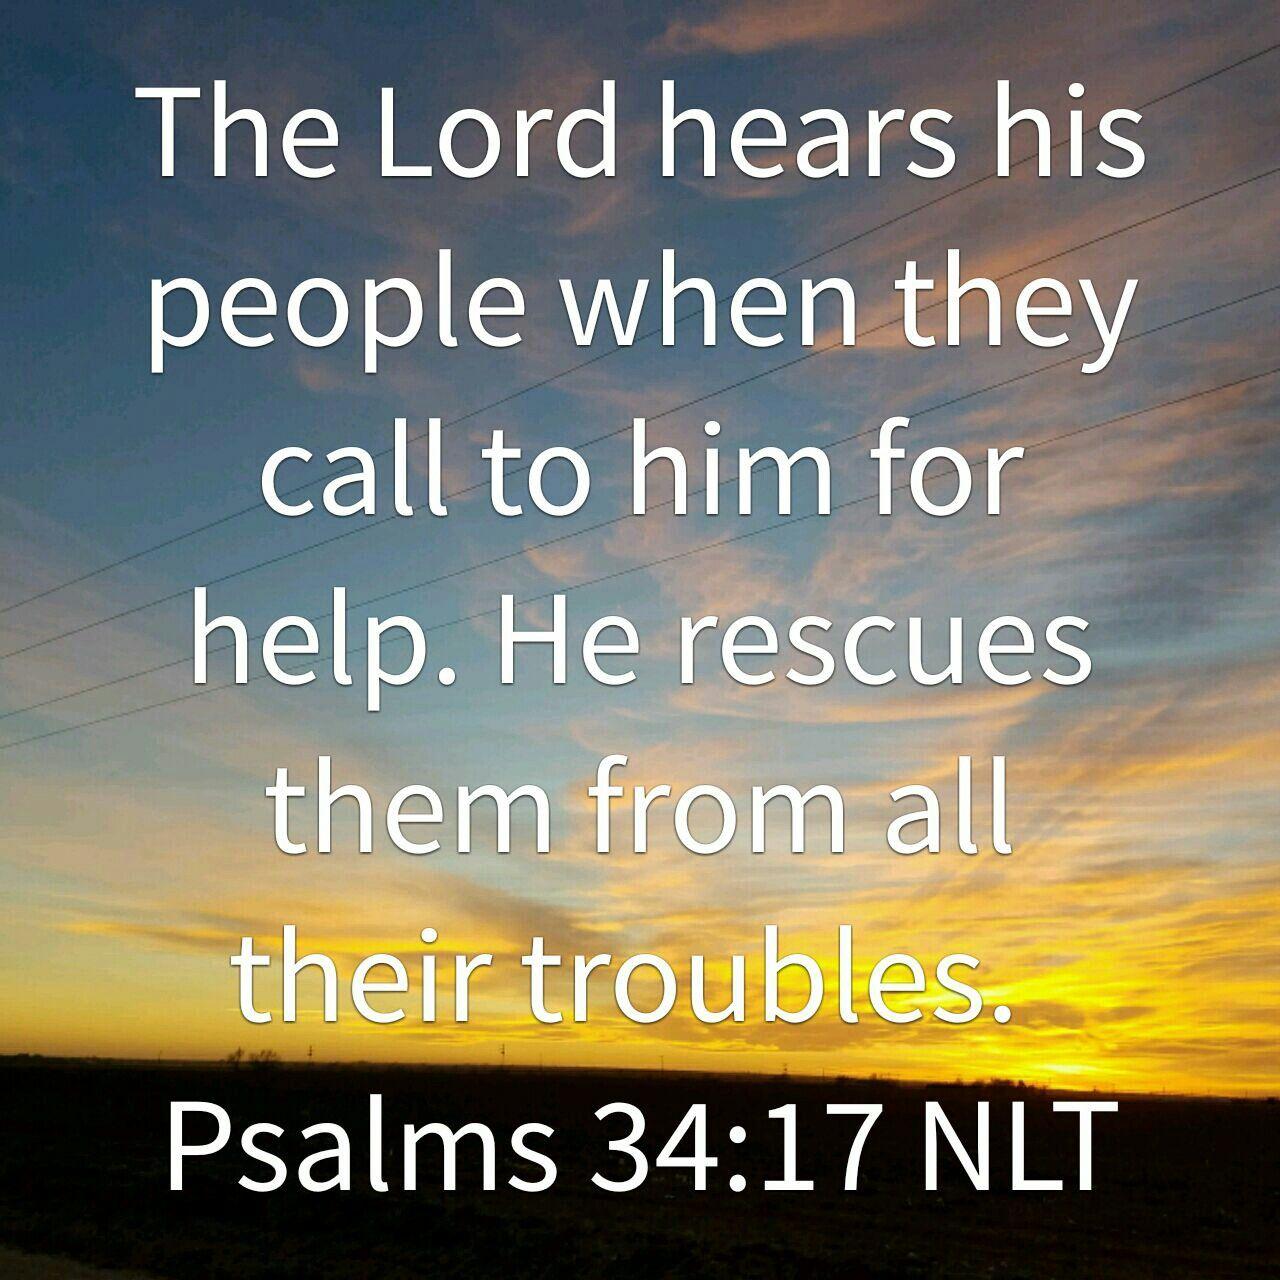 Psalm 34:17 | Scripture verses, Psalm 34 17, Psalms